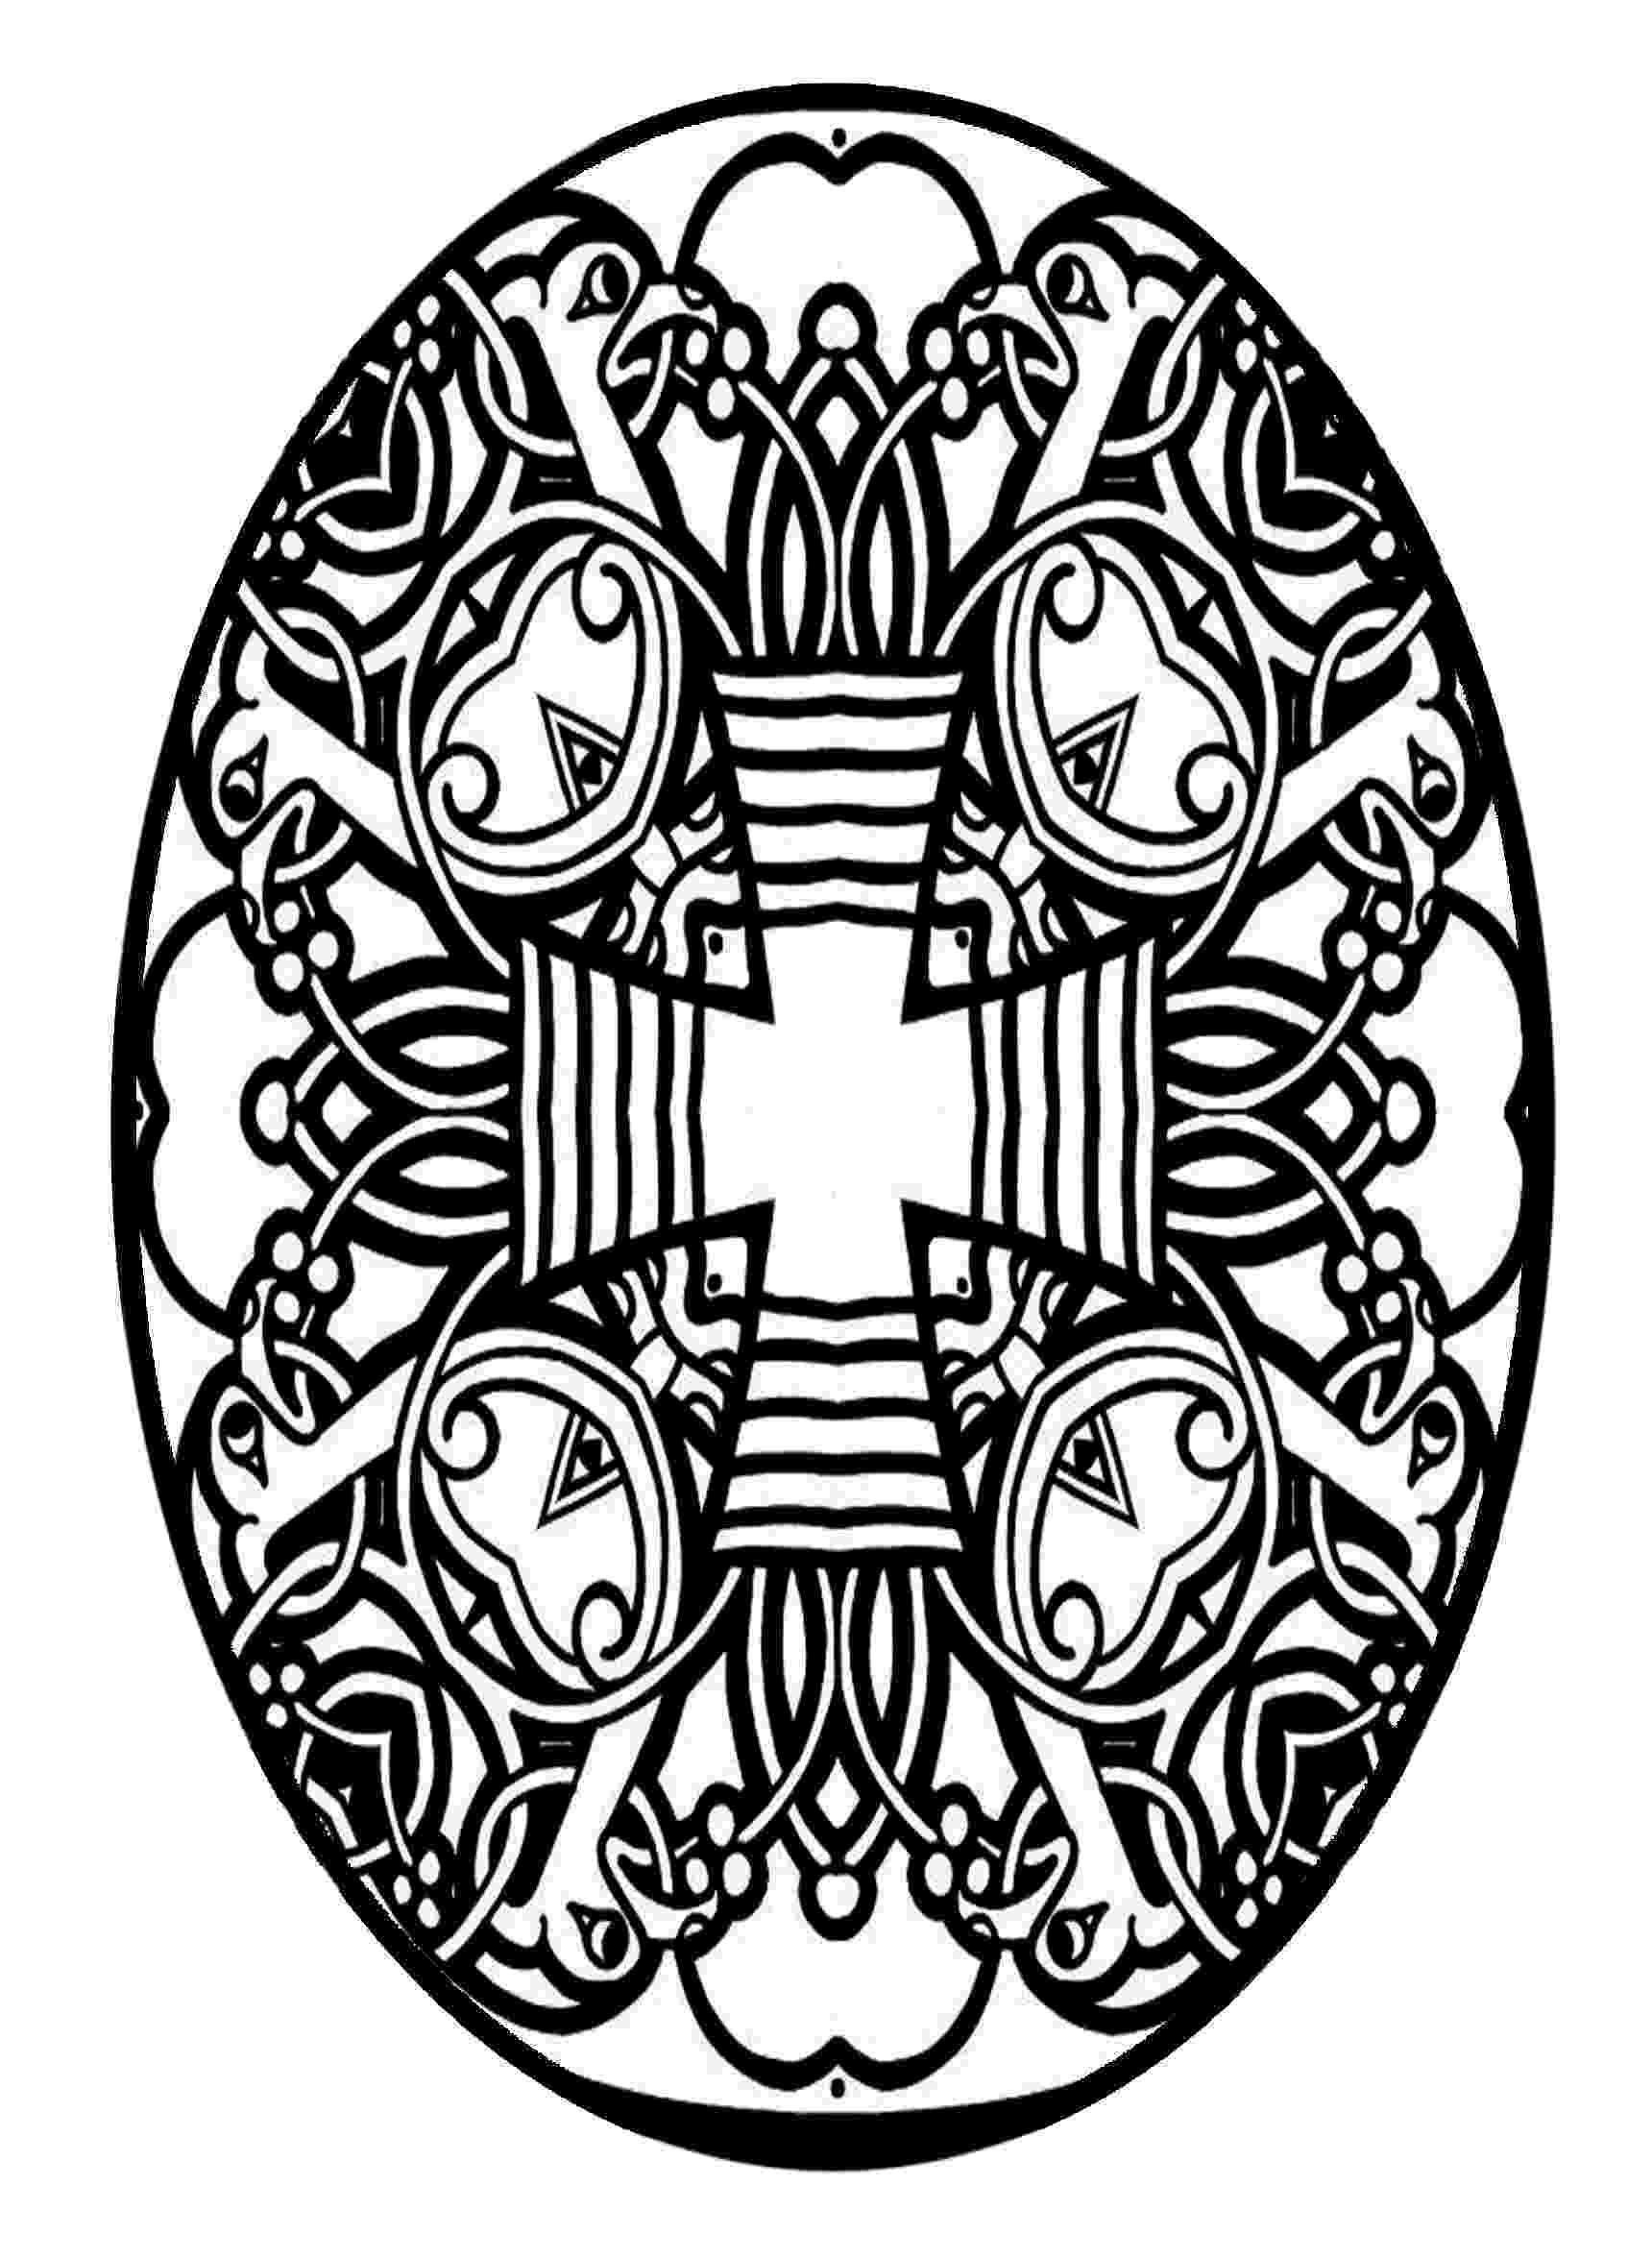 egg coloring sheet plain easter egg coloring pages getcoloringpagescom coloring egg sheet